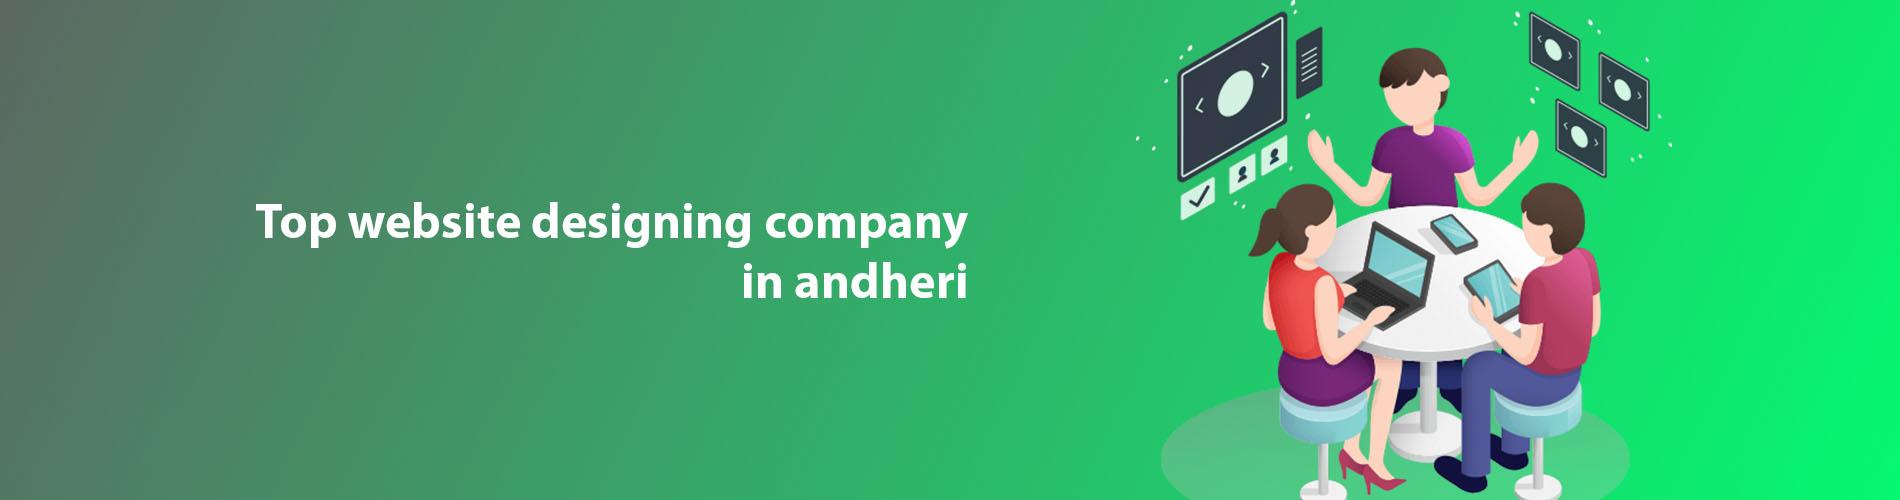 web designing company in andheri mumbai